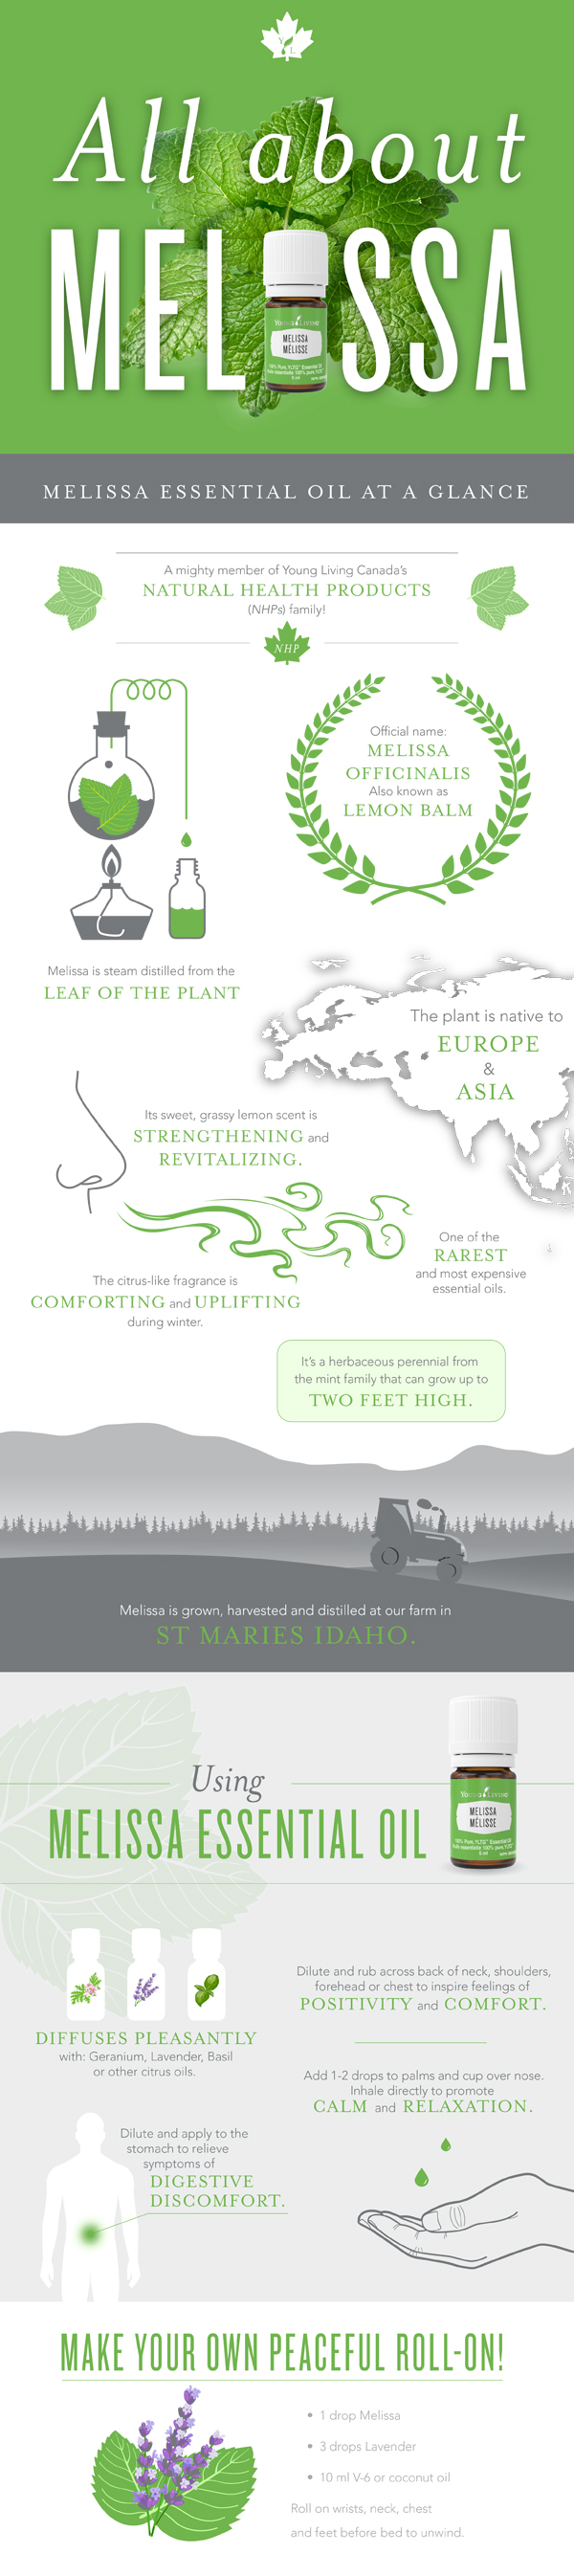 melissaenrollment_infographic_en_ca_0317_bh_r2